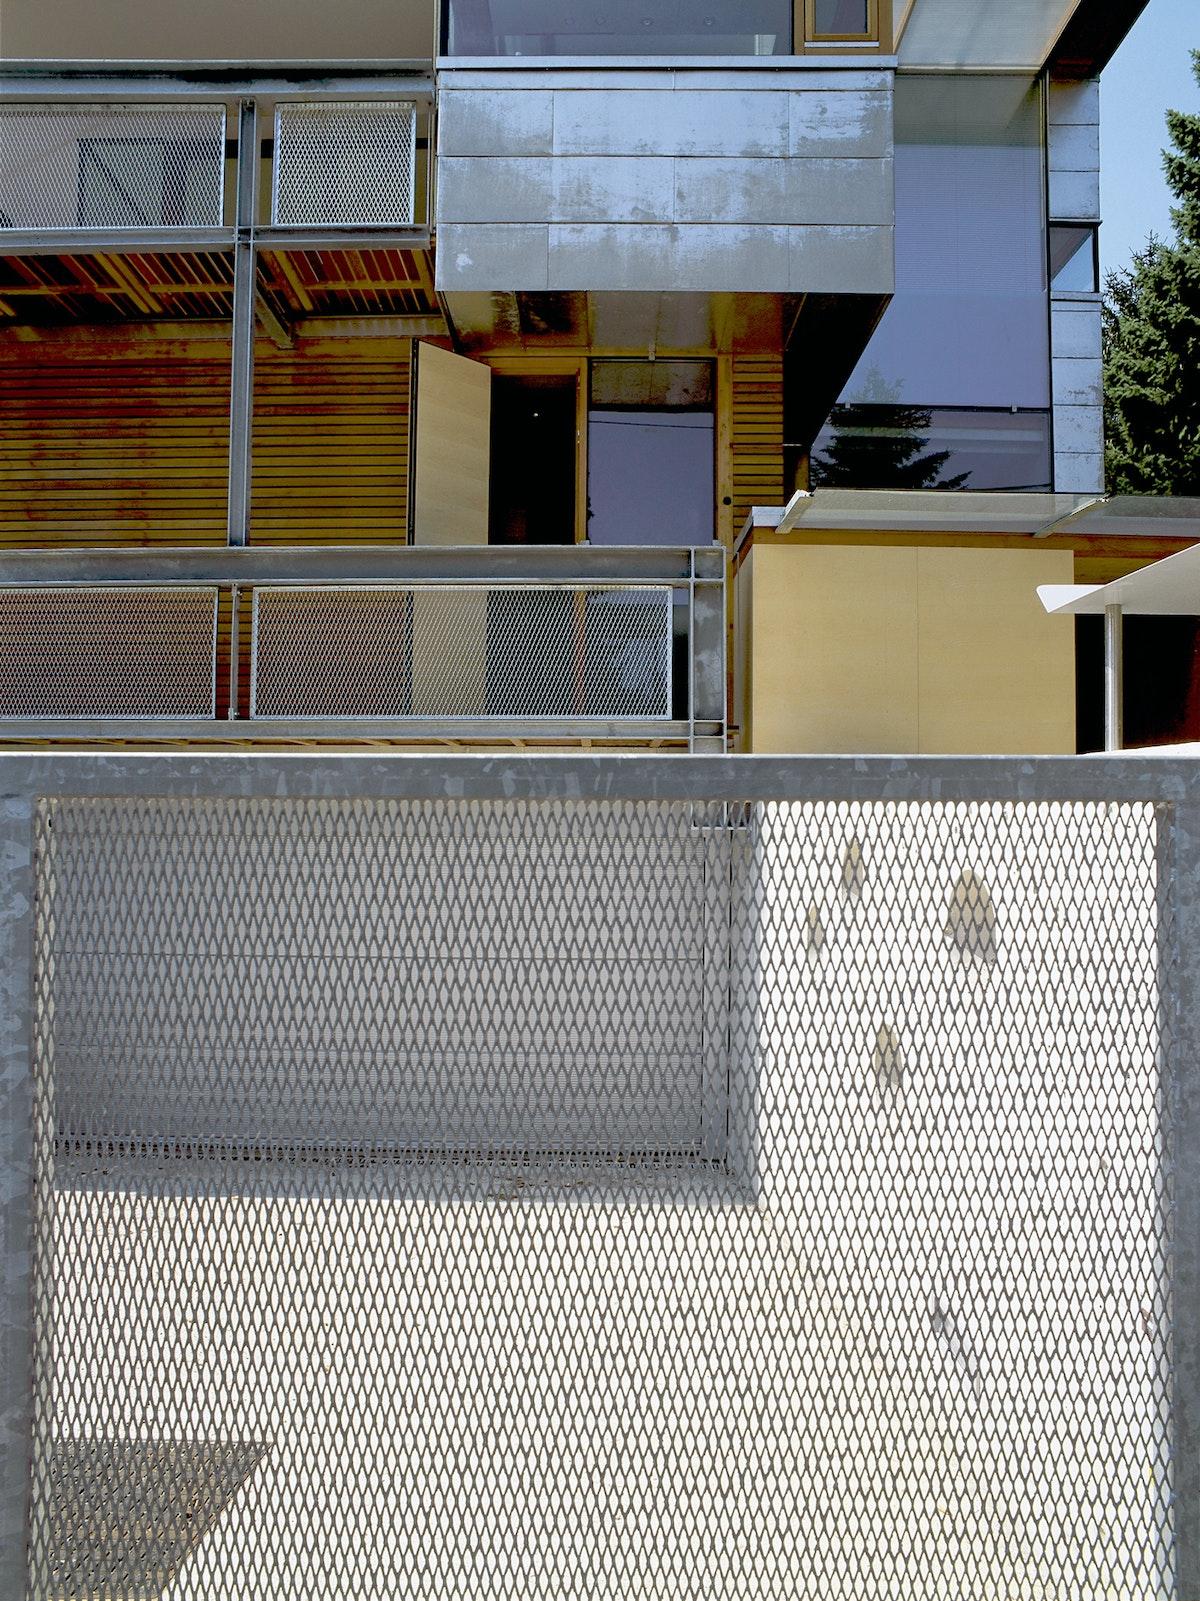 Solar Deck Lew Rodin 79020020